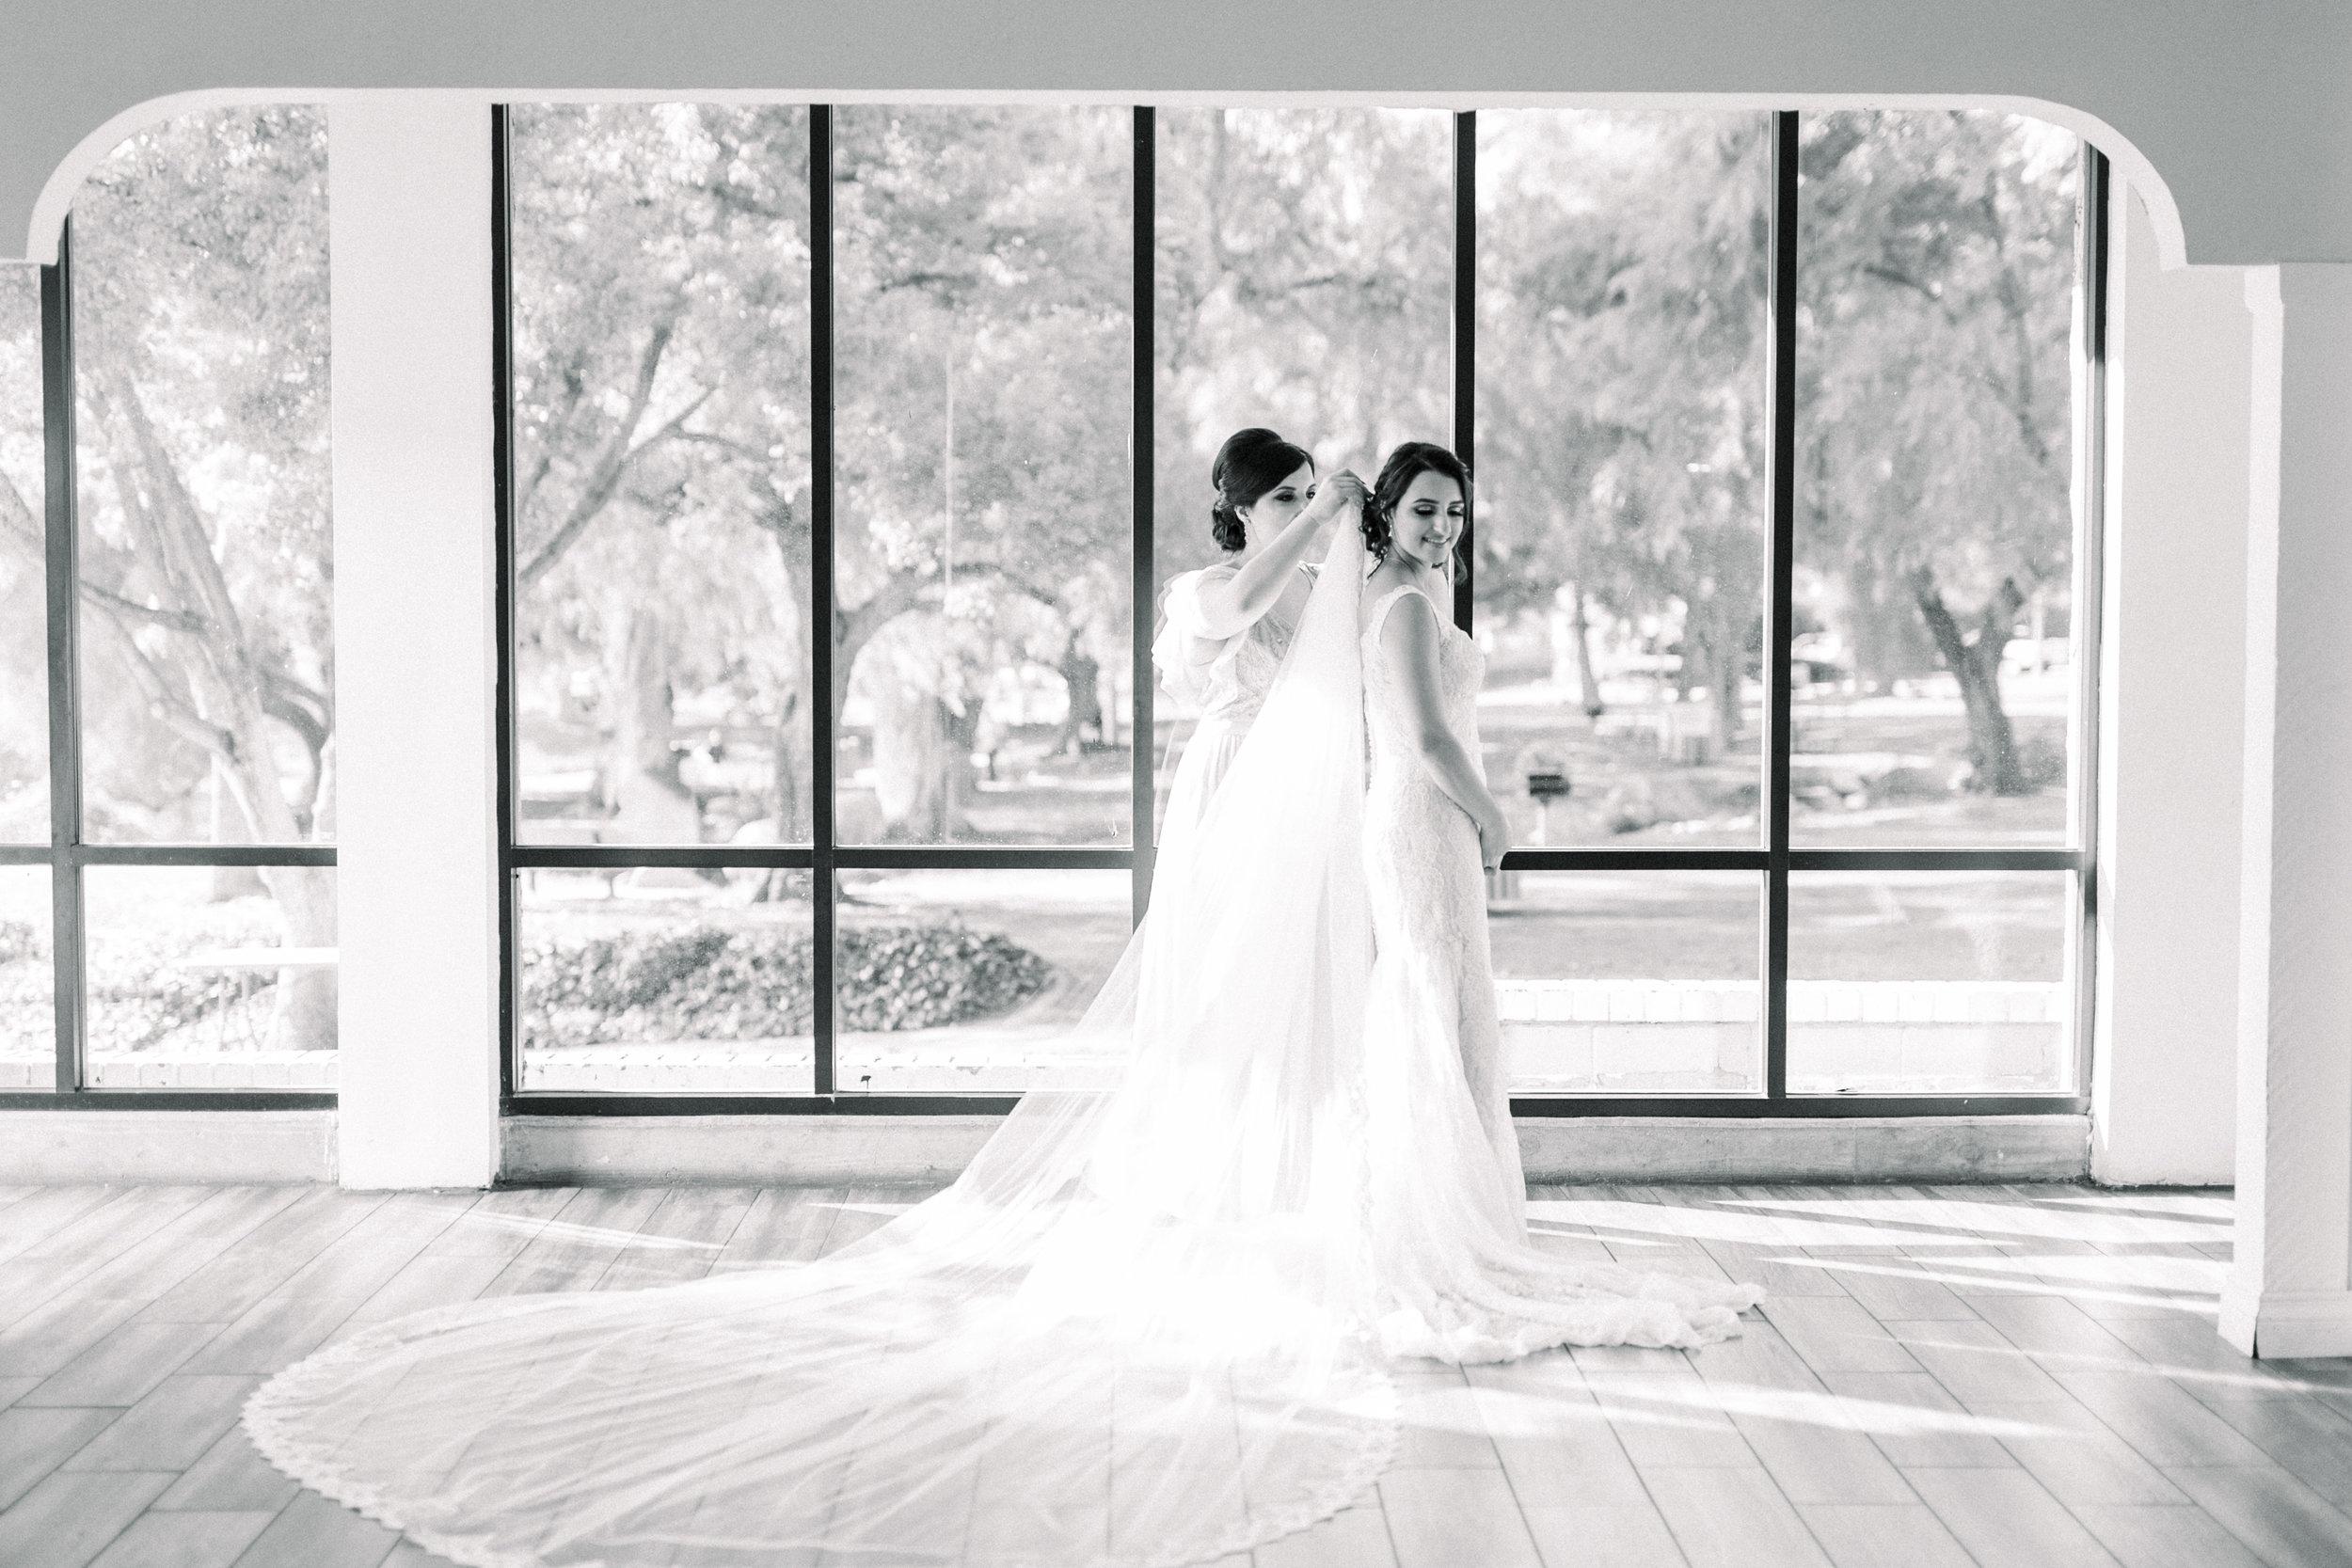 Bridal Portrait Putting on Veil